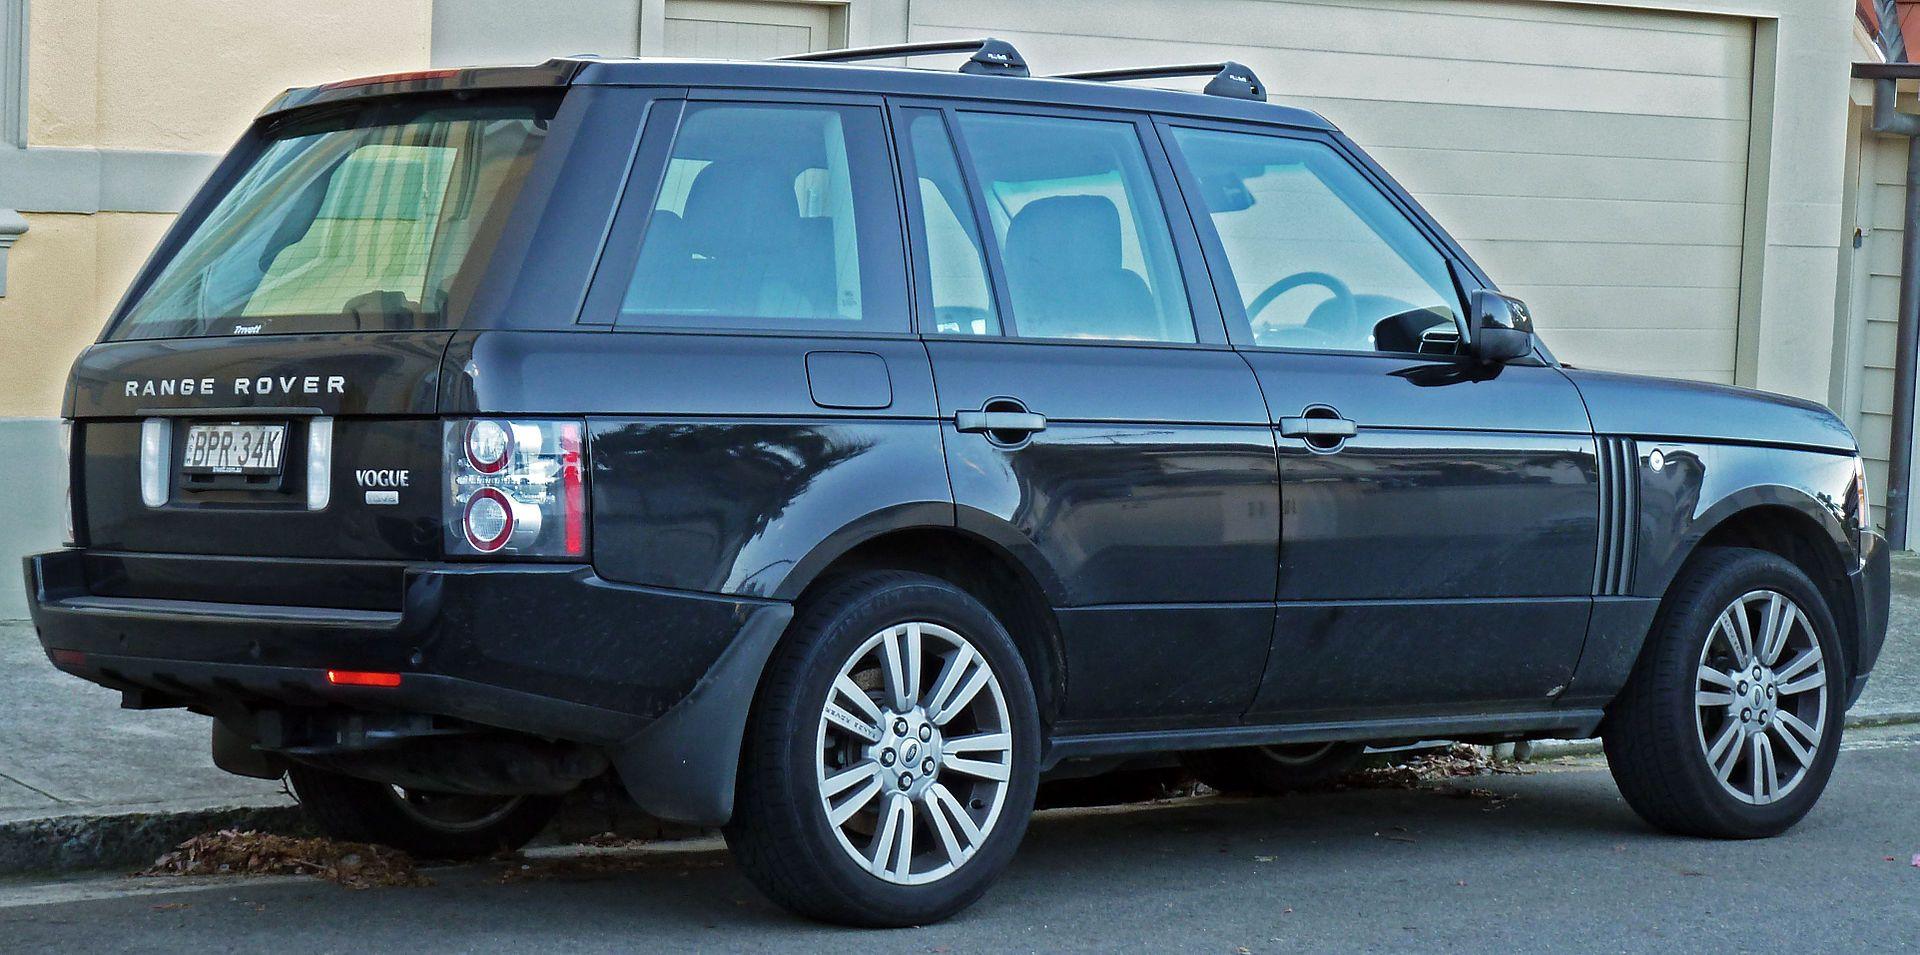 2010 Land Rover Range Rover Vogue (L322) TDV8 Luxury wagon